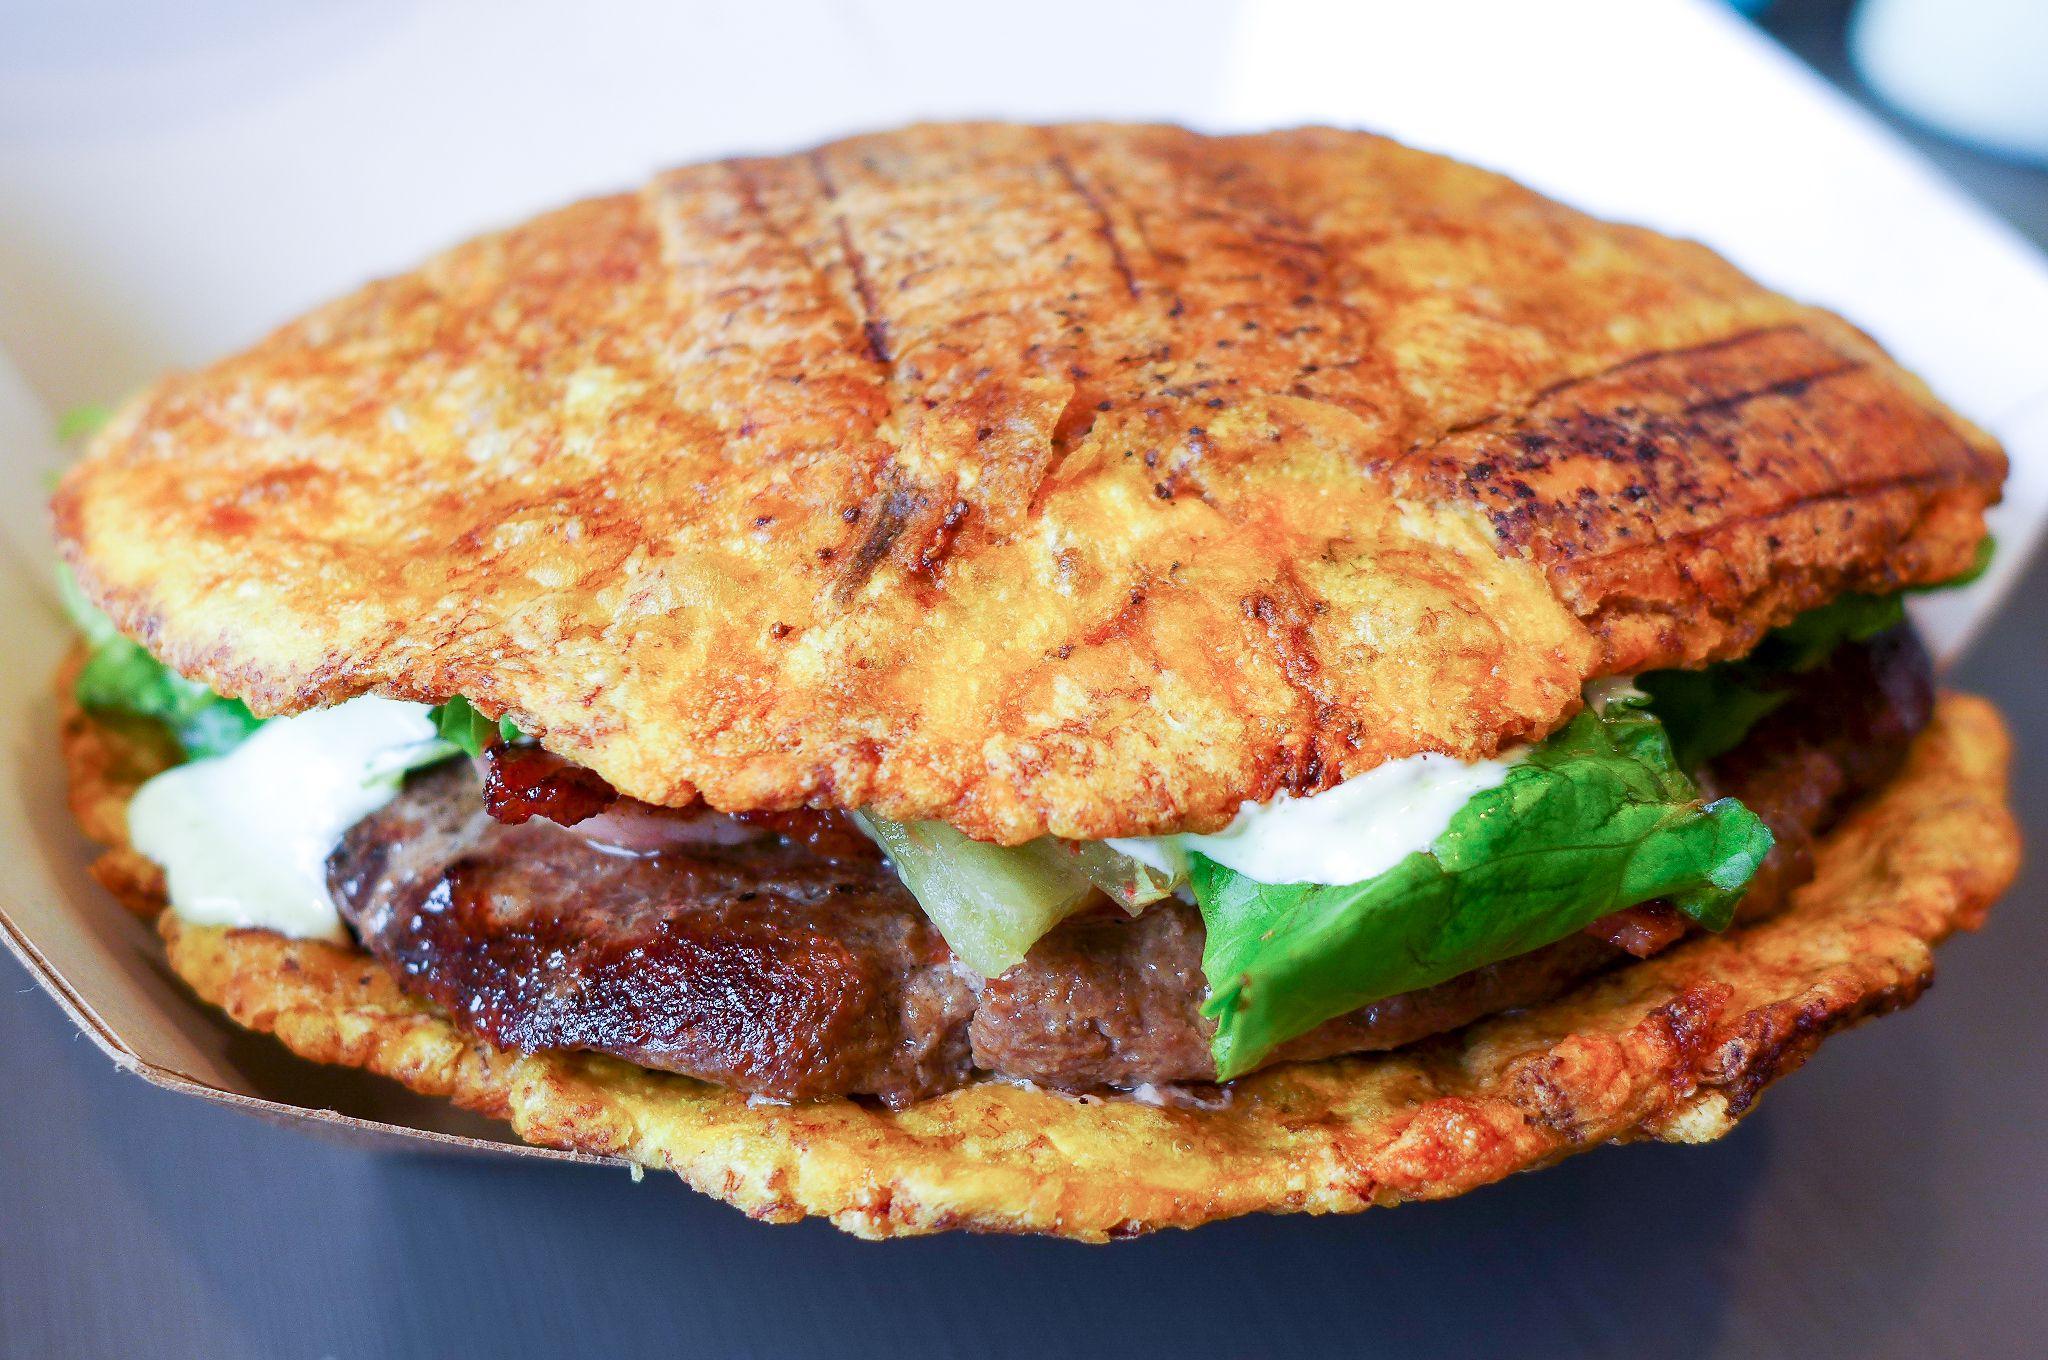 ... balkan pljeskavica the venezuelan patacon burger easily fills its